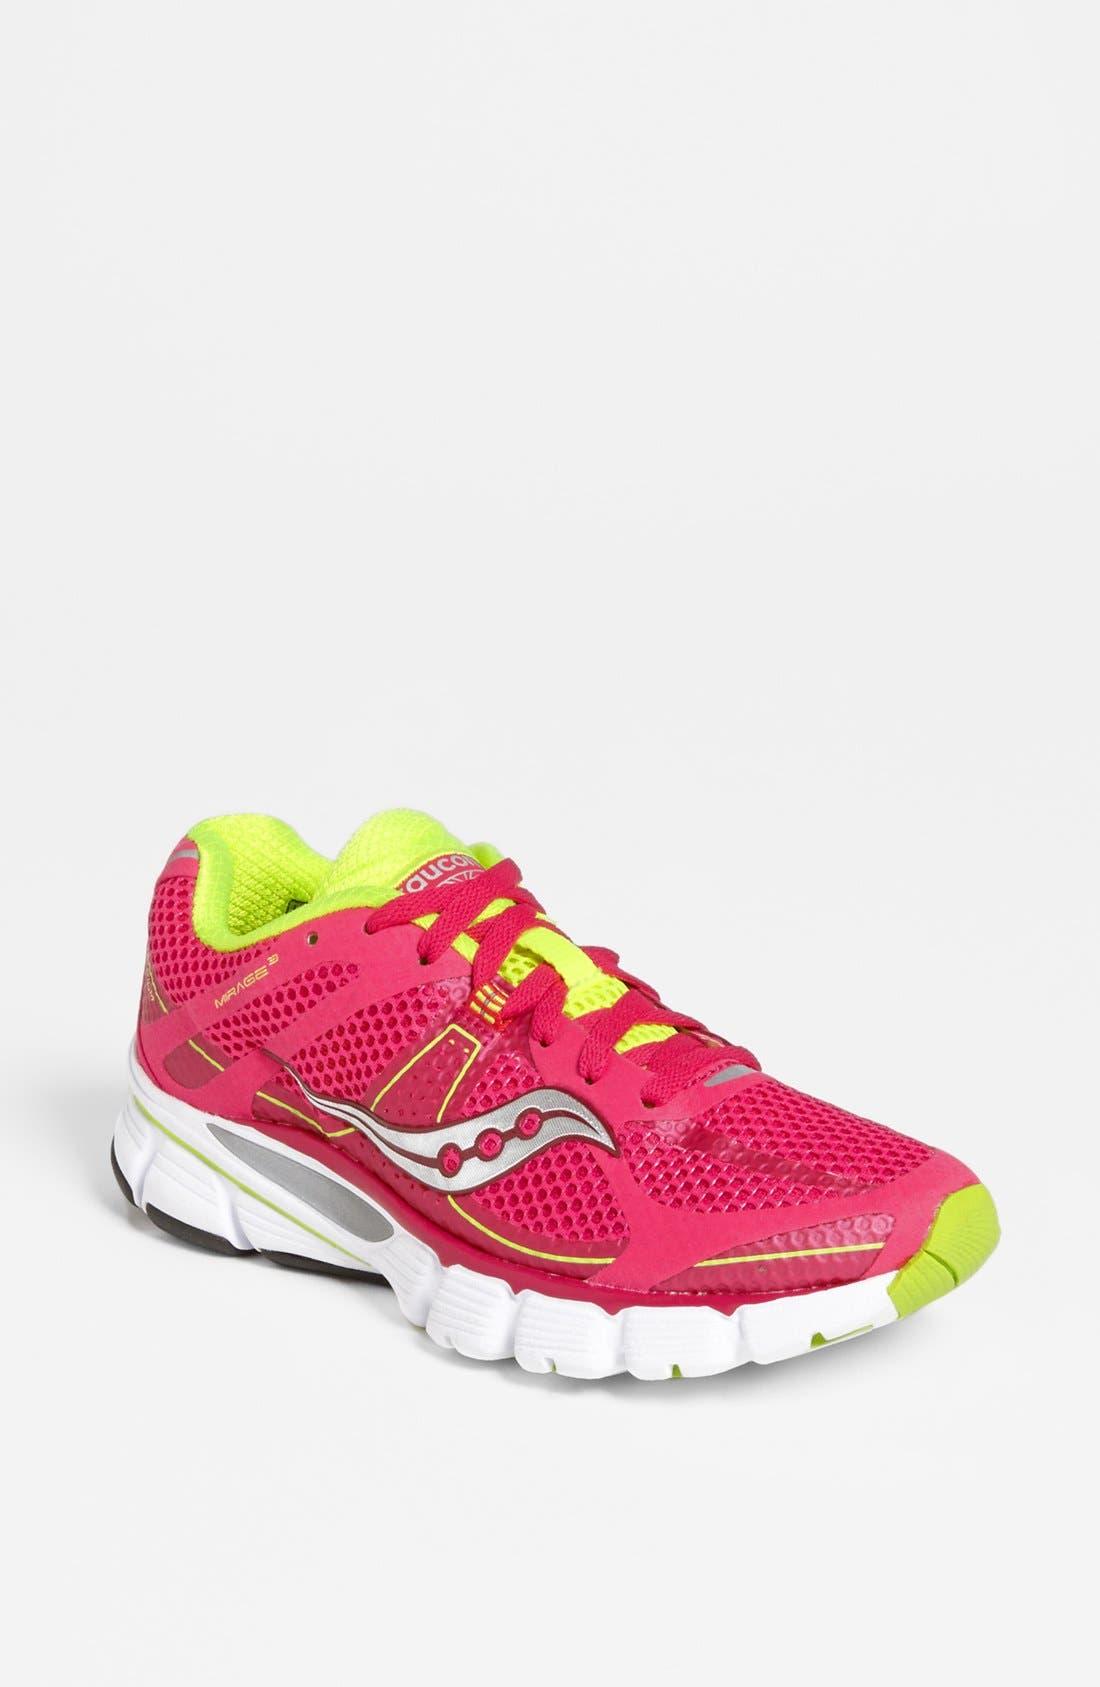 Main Image - Saucony 'Mirage 3' Running Shoe (Women) (Regular Retail Price: $109.95)